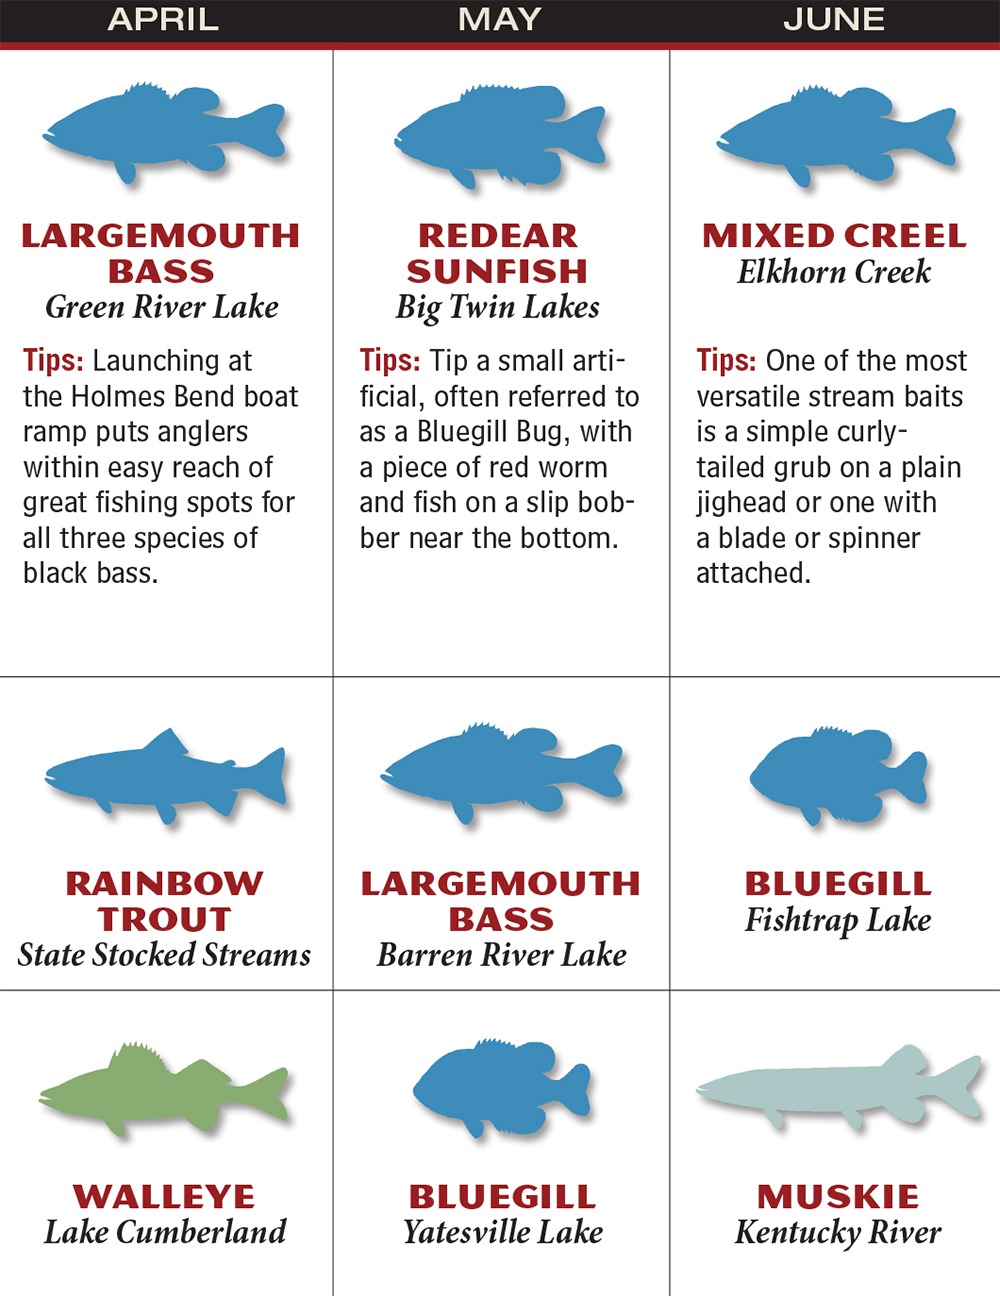 Kentucky 2016 Fishing Calendar